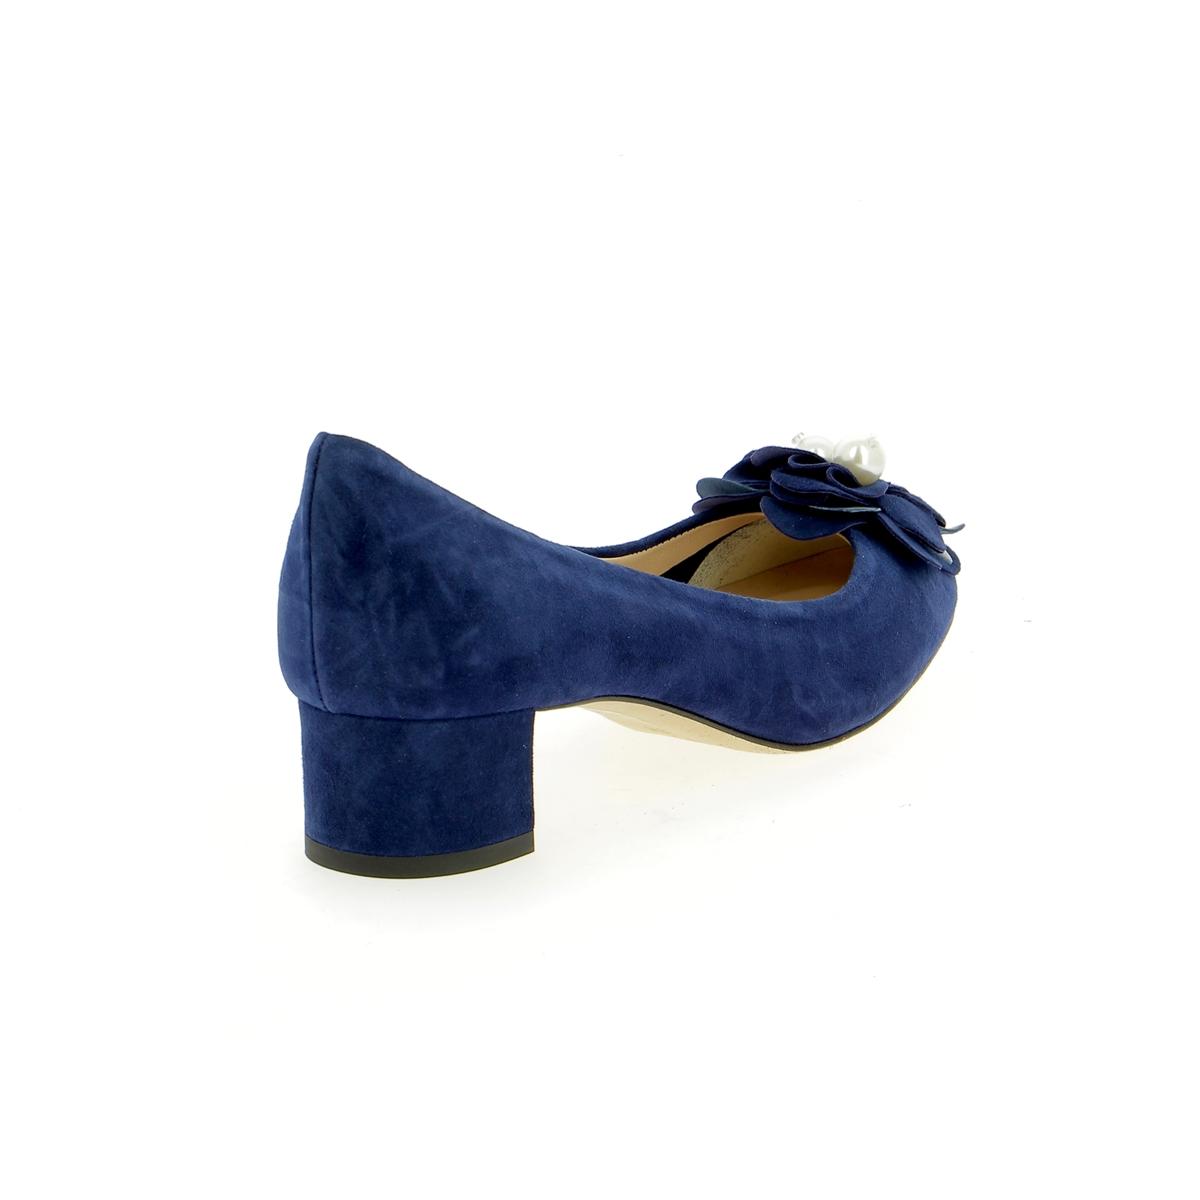 Delaere Pumps blauw